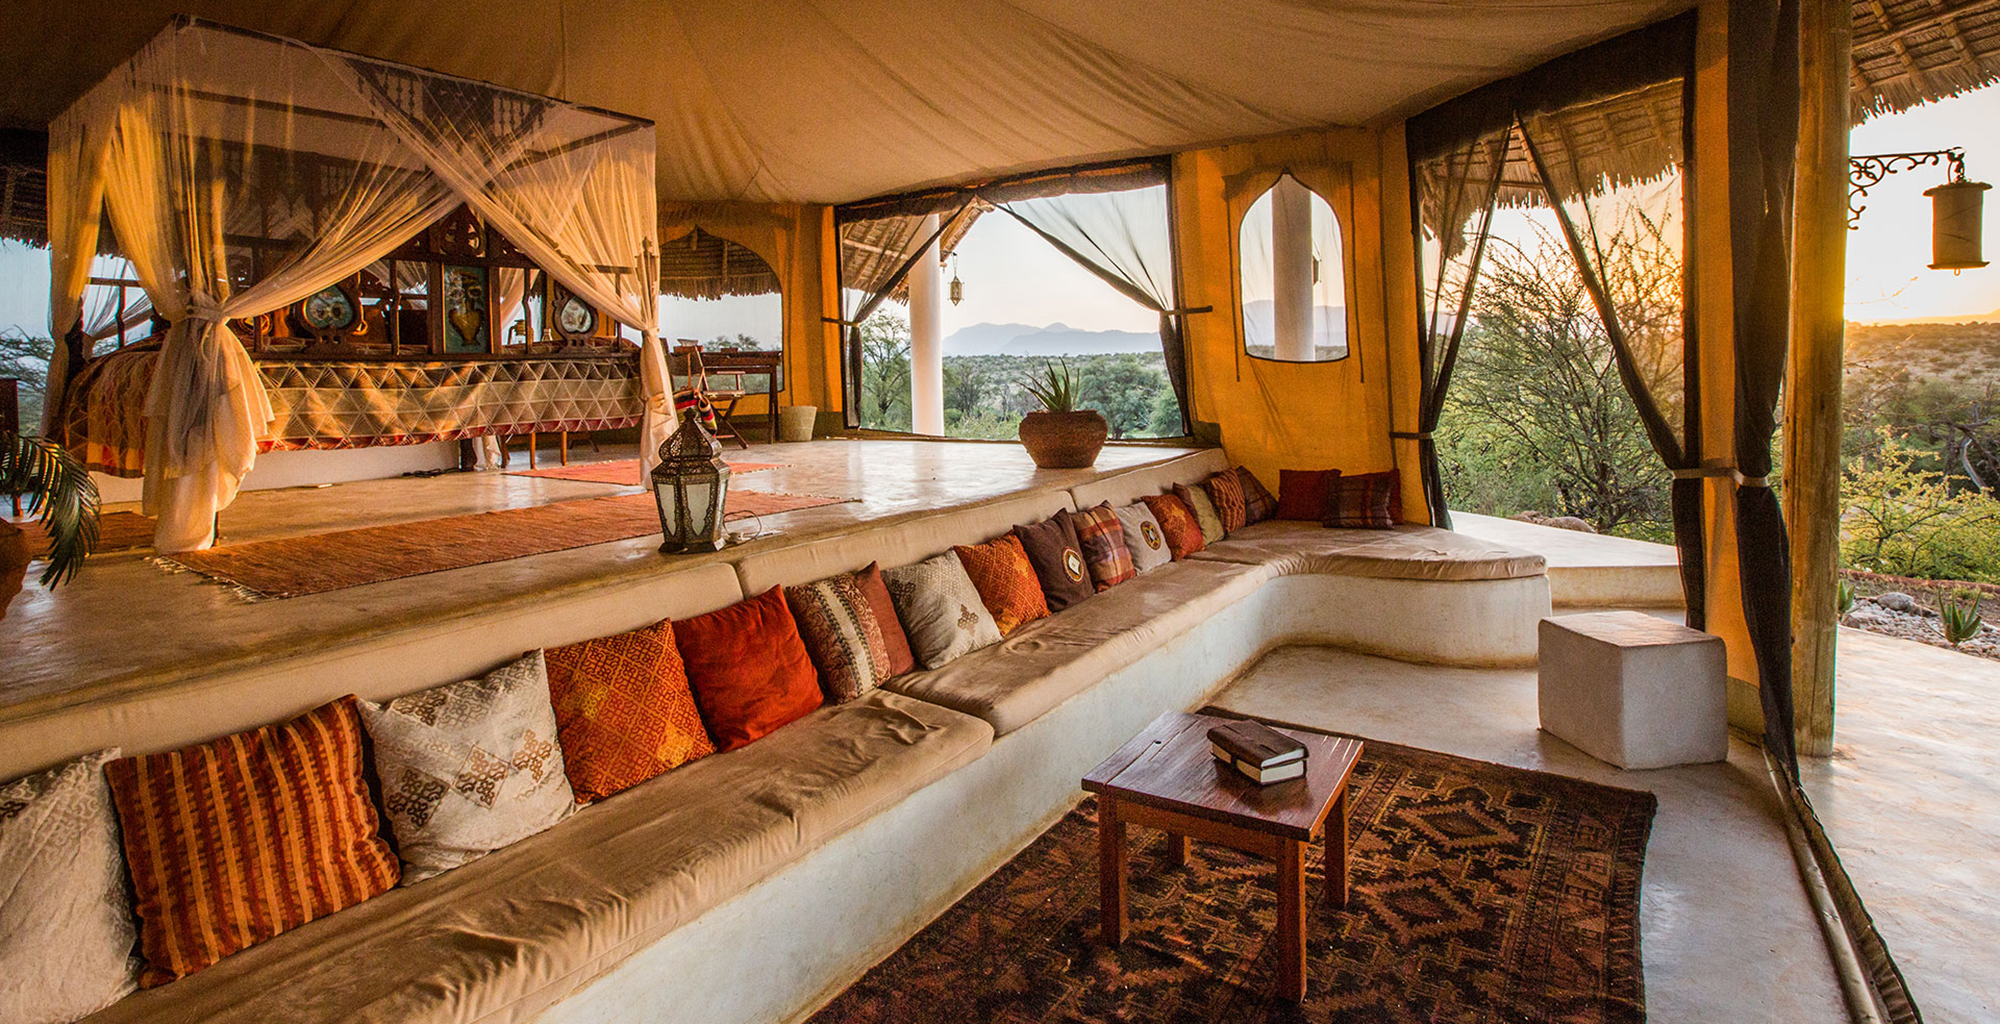 Kenya-Sasaab-Camp-Lounge